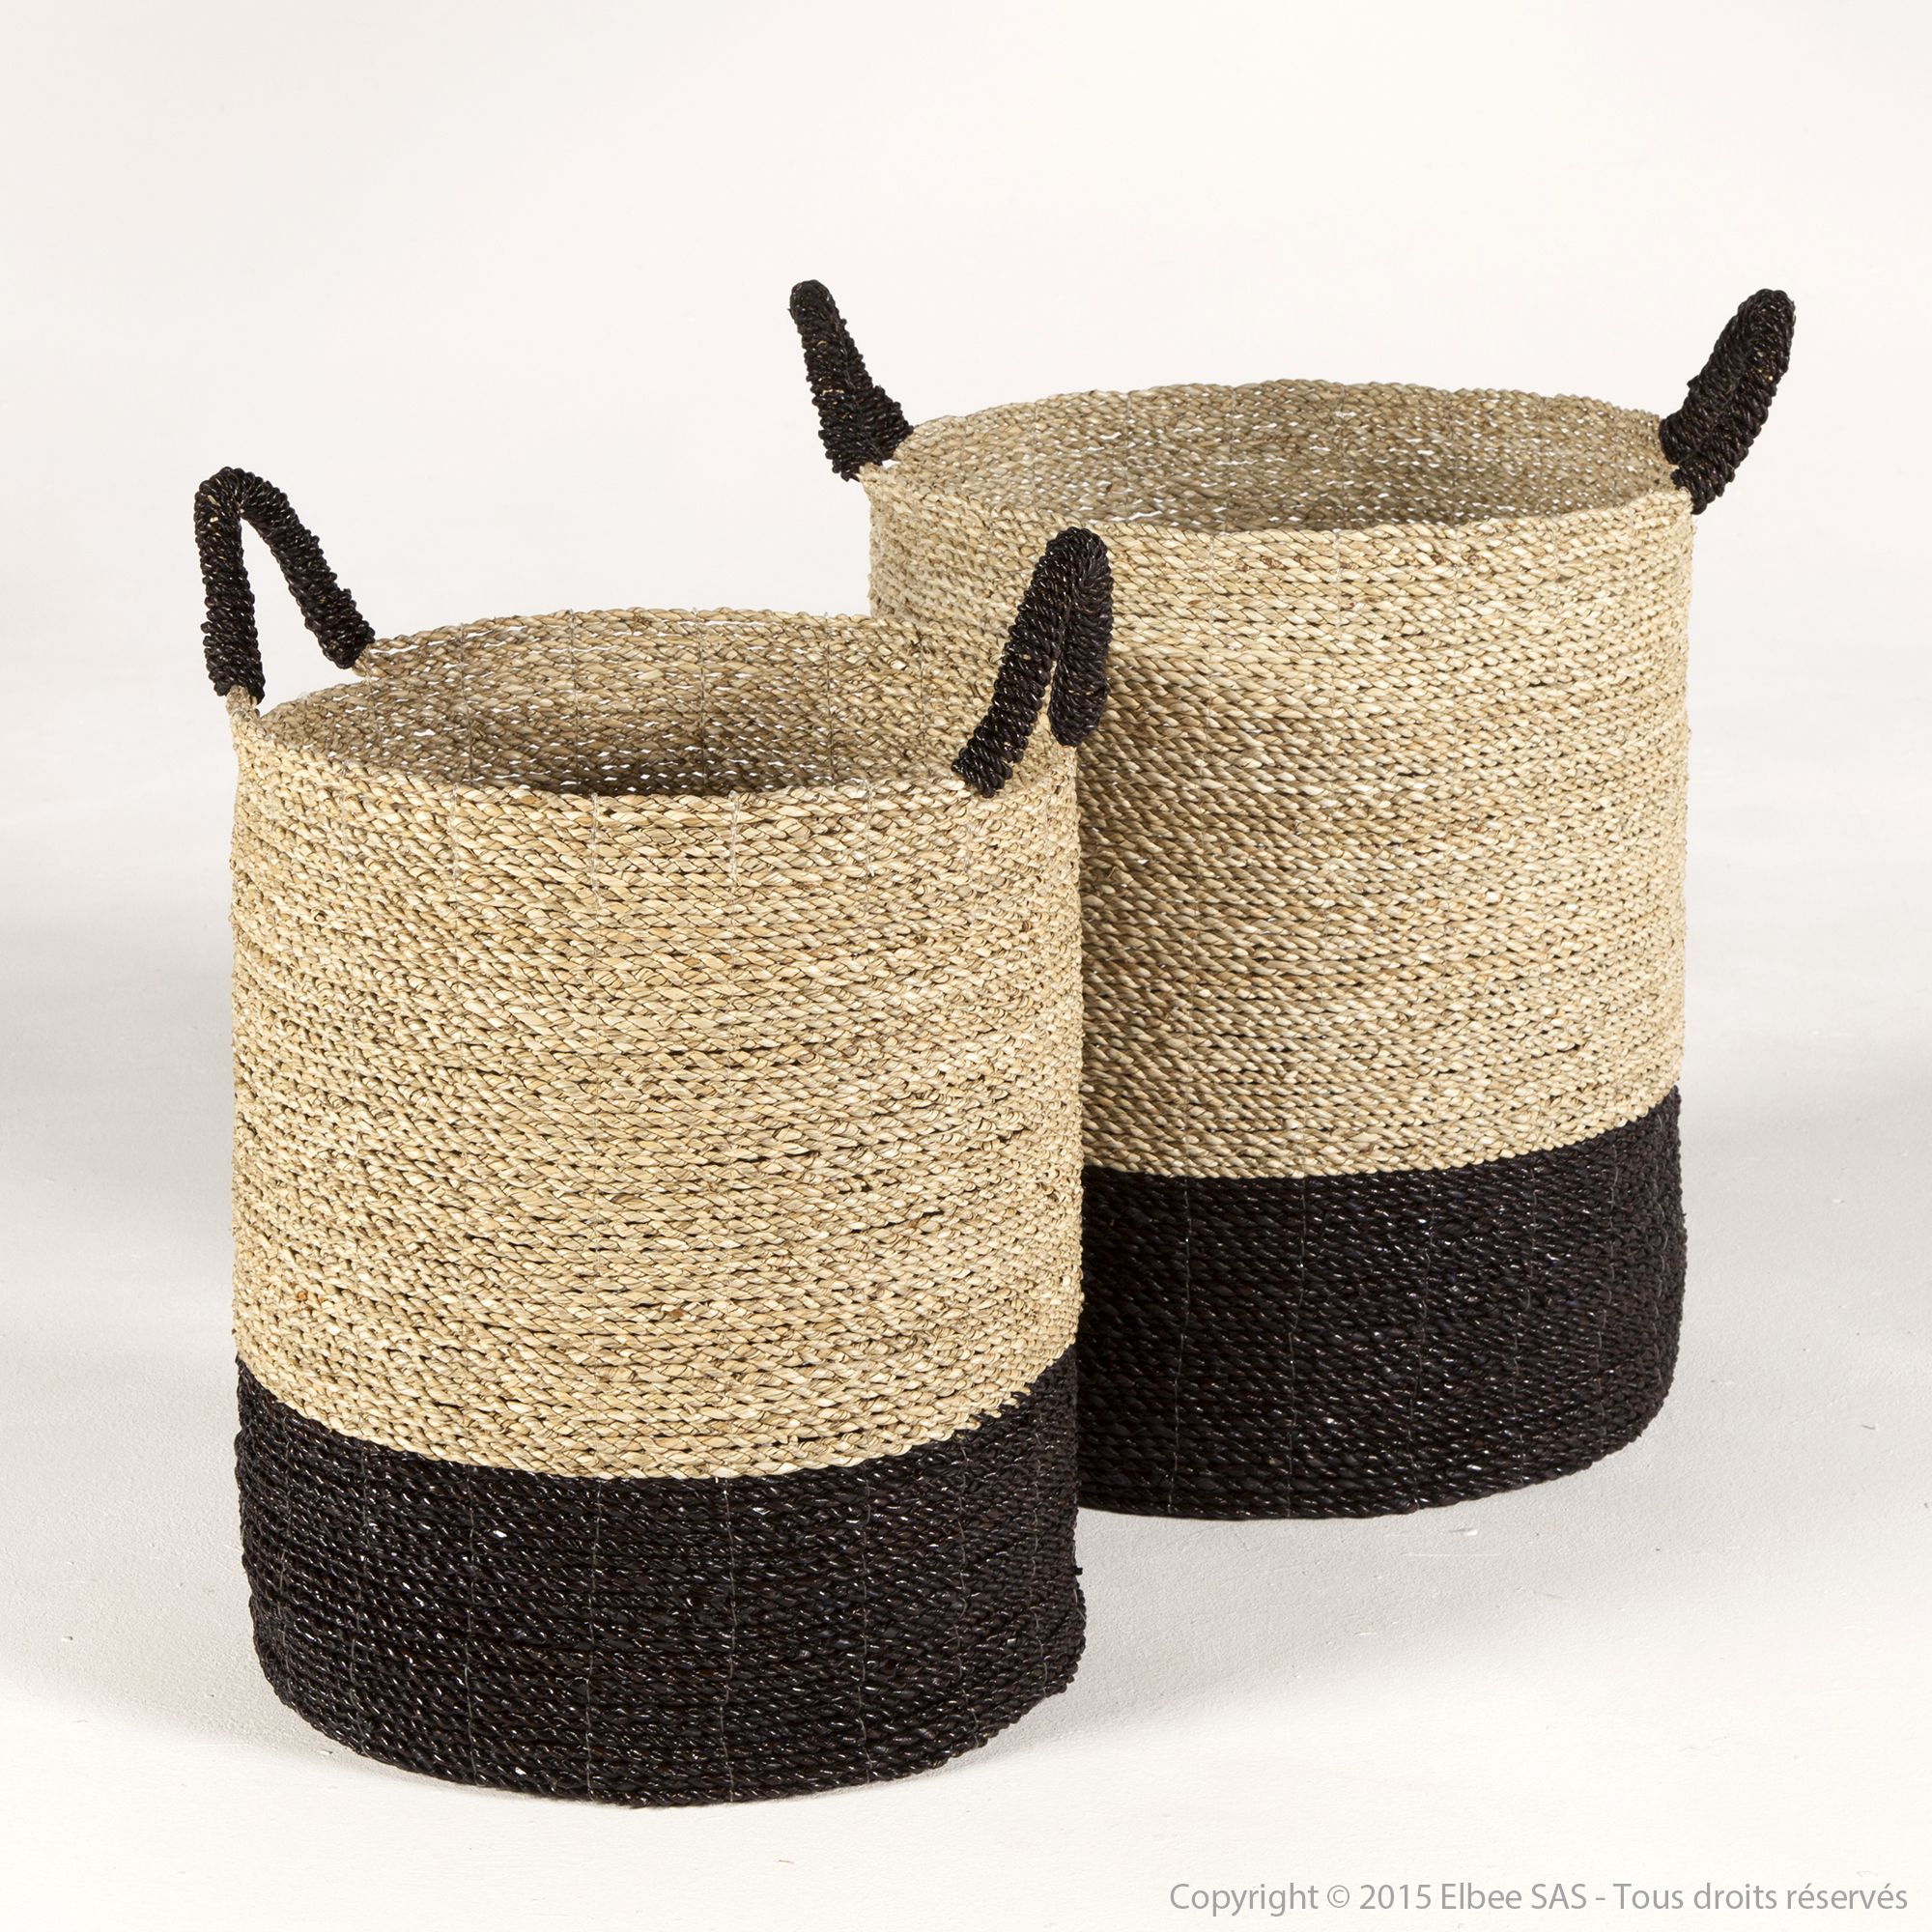 panier de rangement en jonc de mer torsad bicolore noir daytona house bay en solde d co. Black Bedroom Furniture Sets. Home Design Ideas